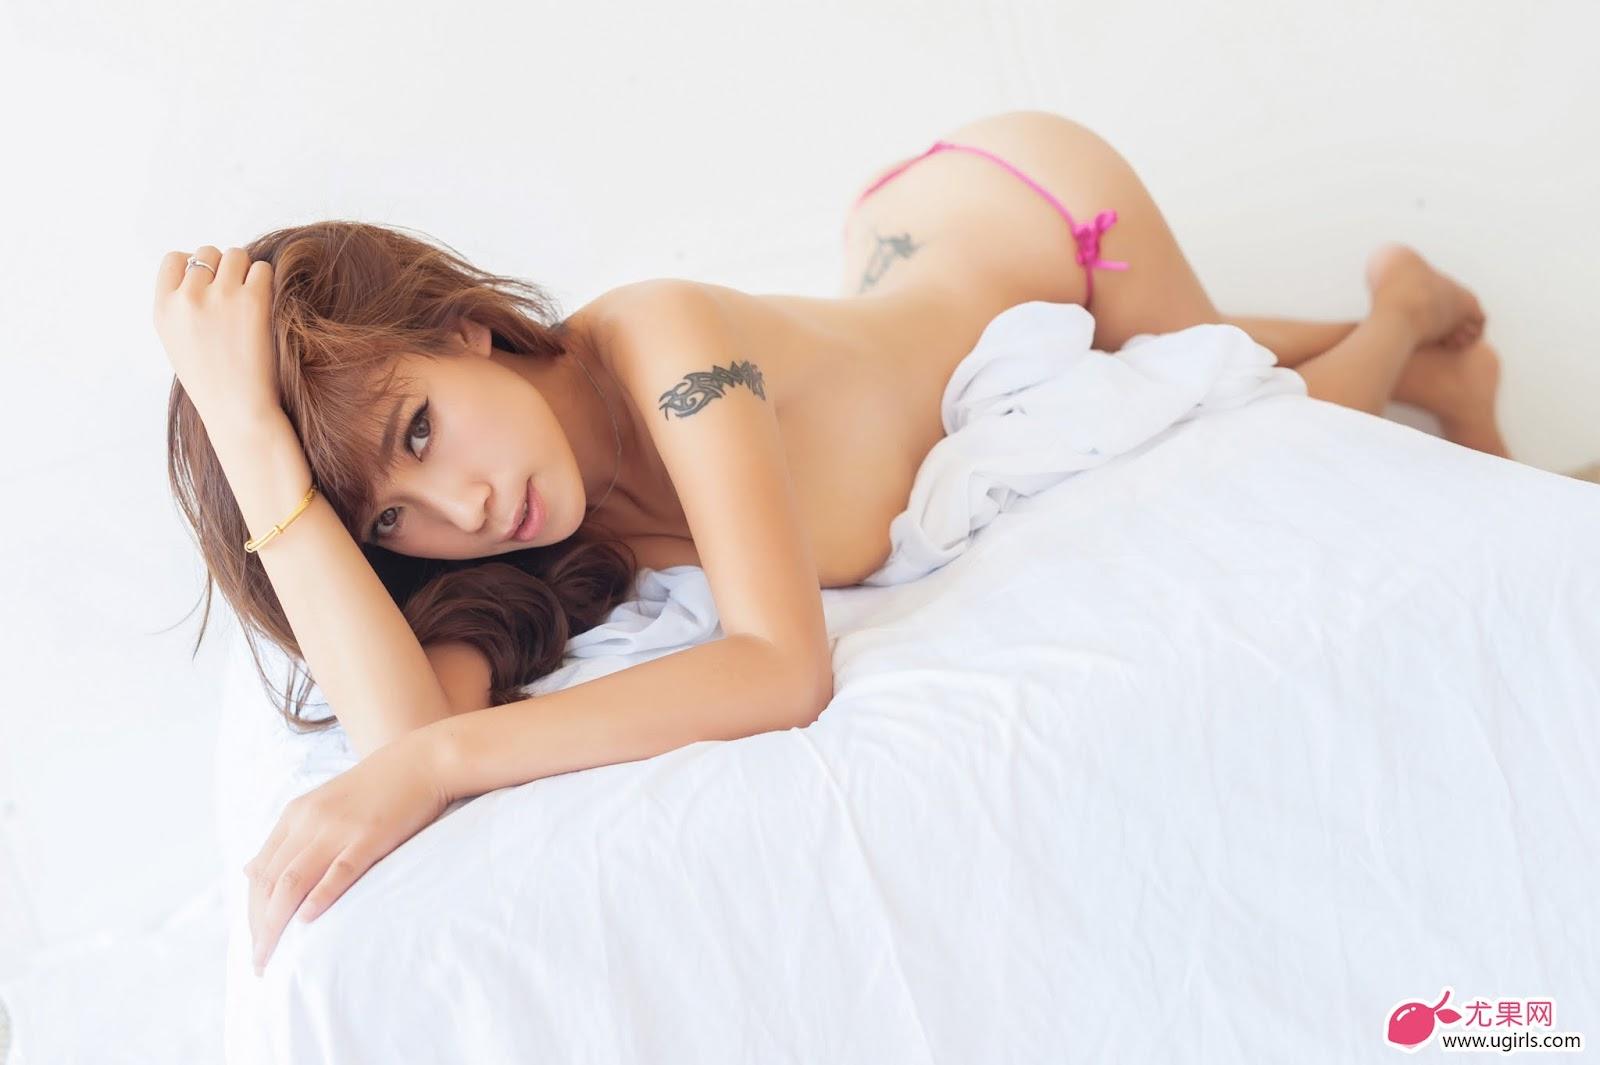 DLS 0355 - Hot Girl Ugirls No.021 Model: 田依依